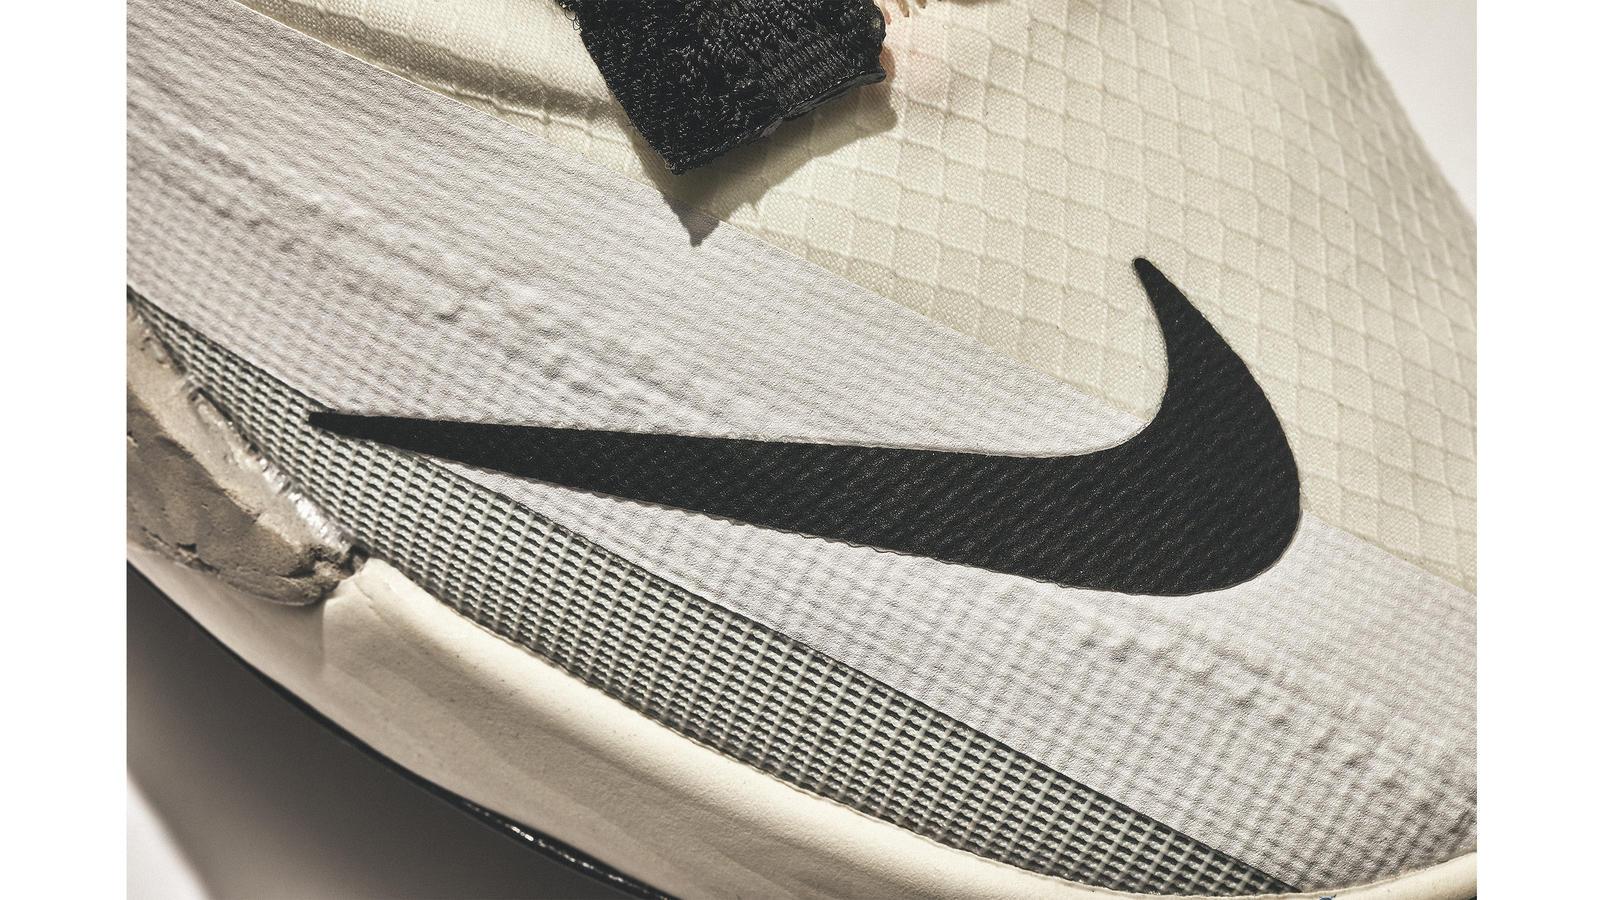 Nike ISPA Drifter Gator 24